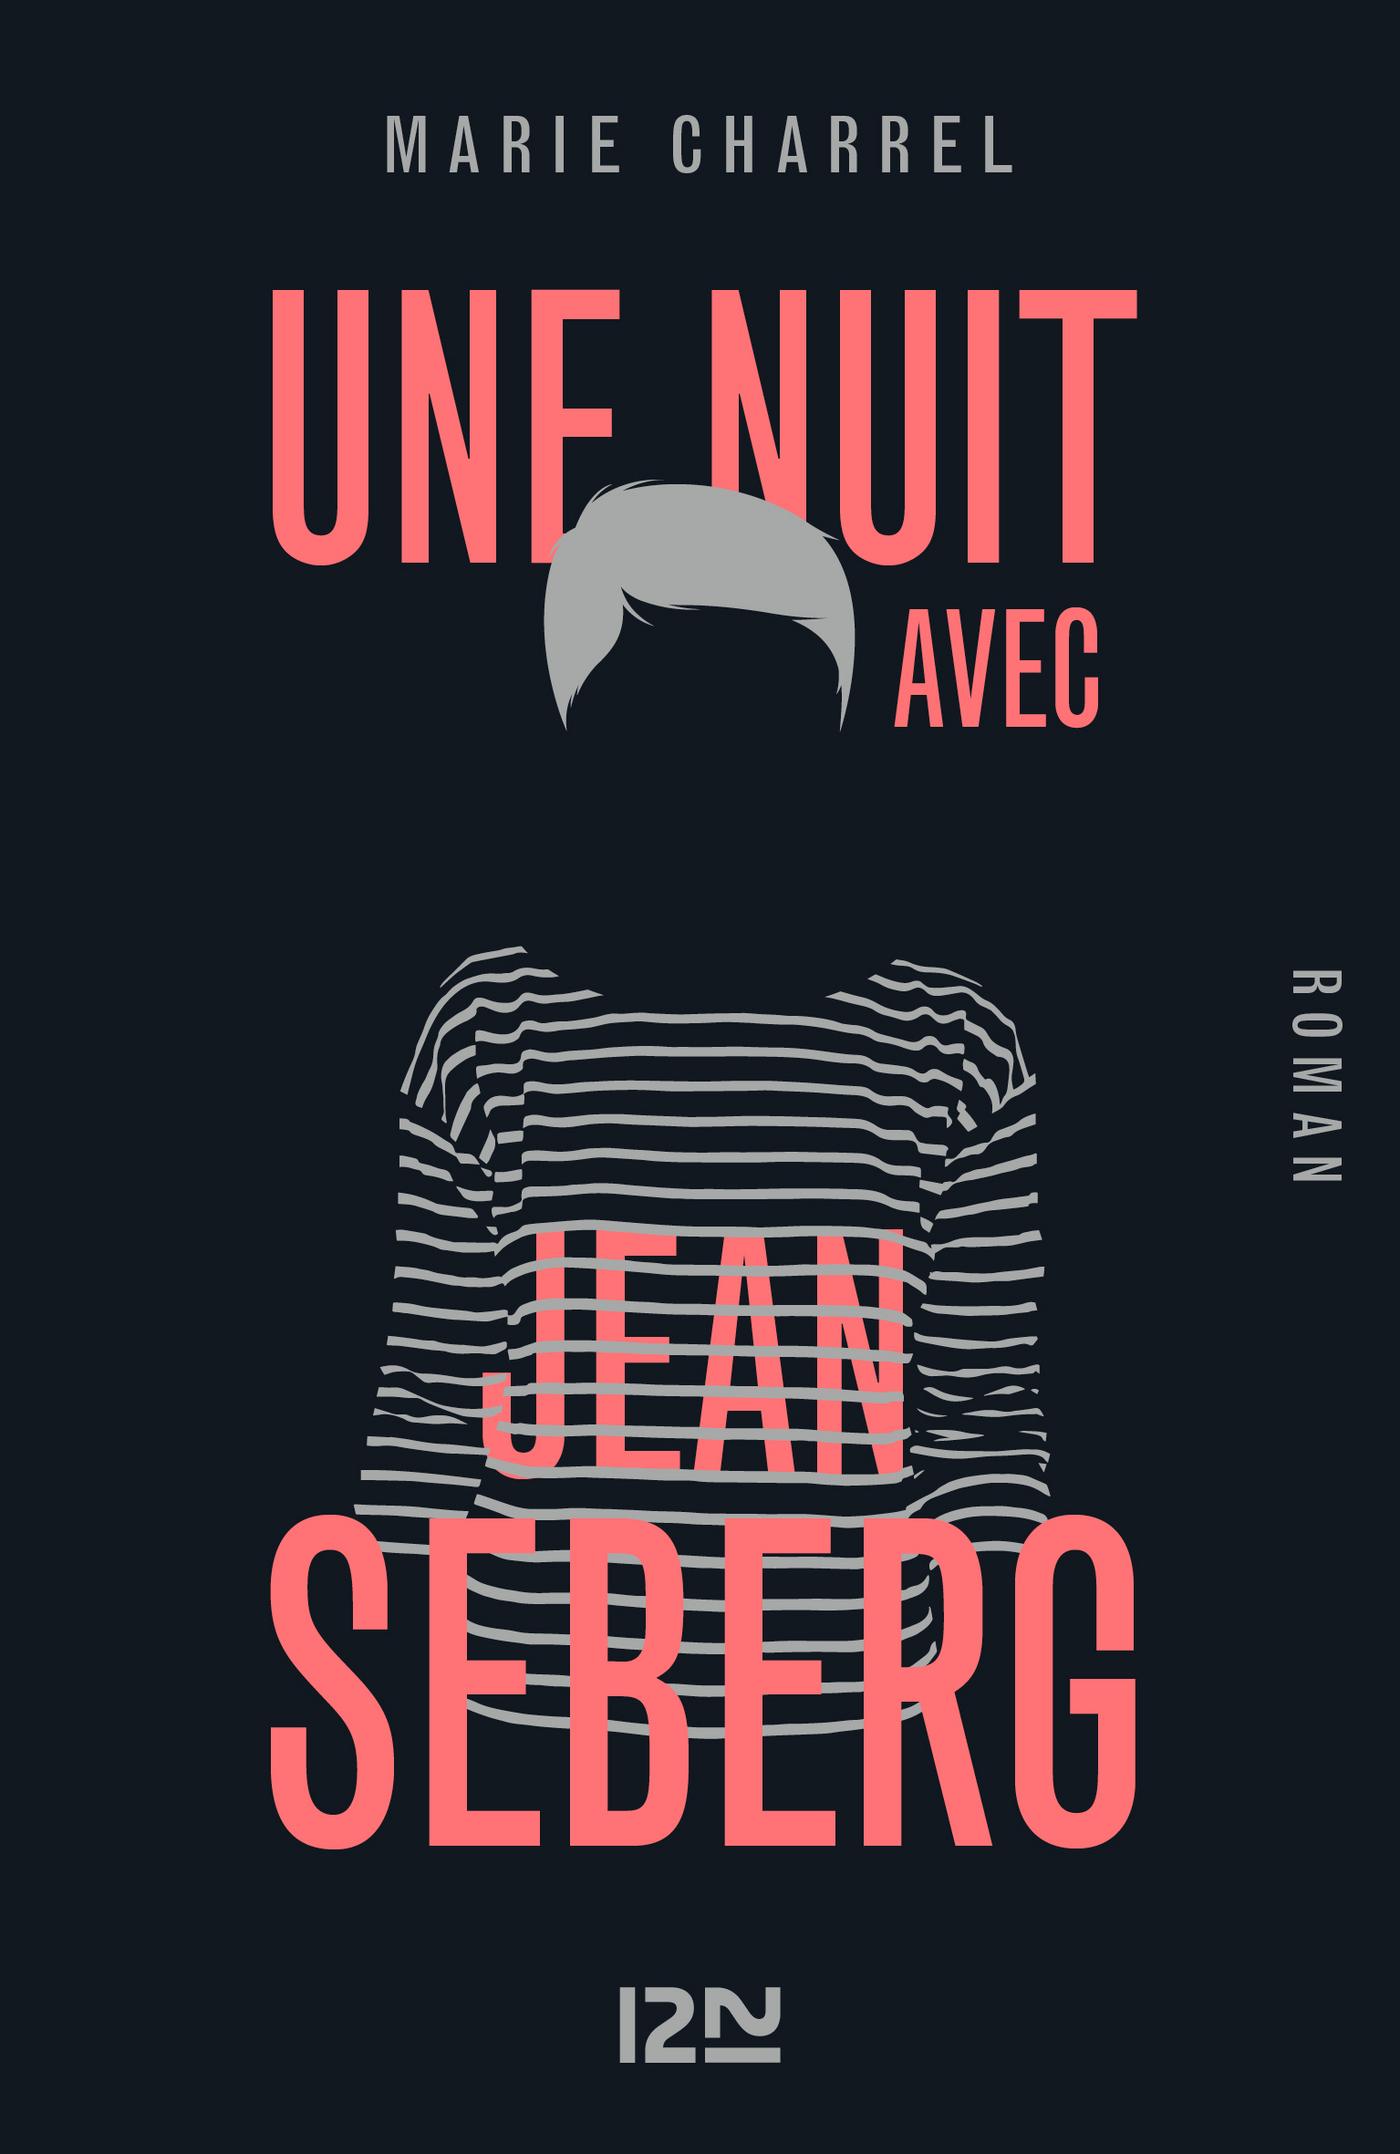 Une nuit avec Jean Seberg | CHARREL, Marie